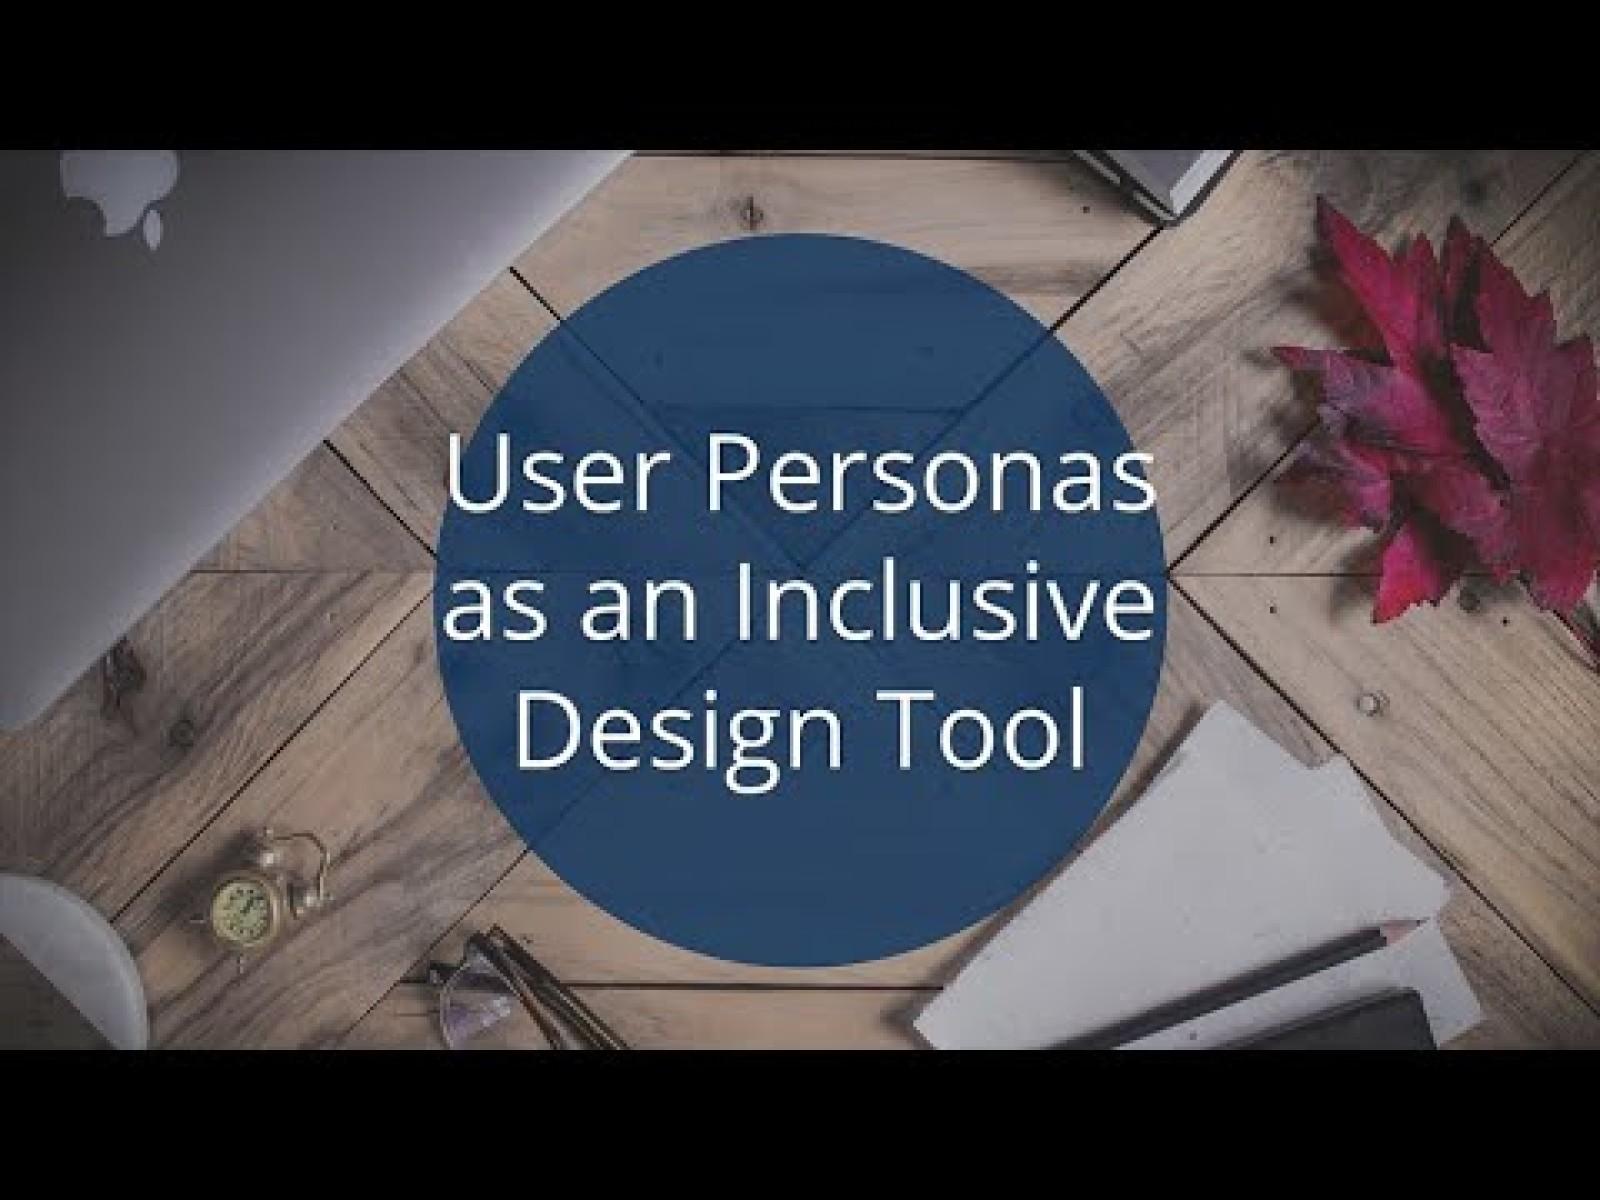 User Personas as an Inclusive Design Tool